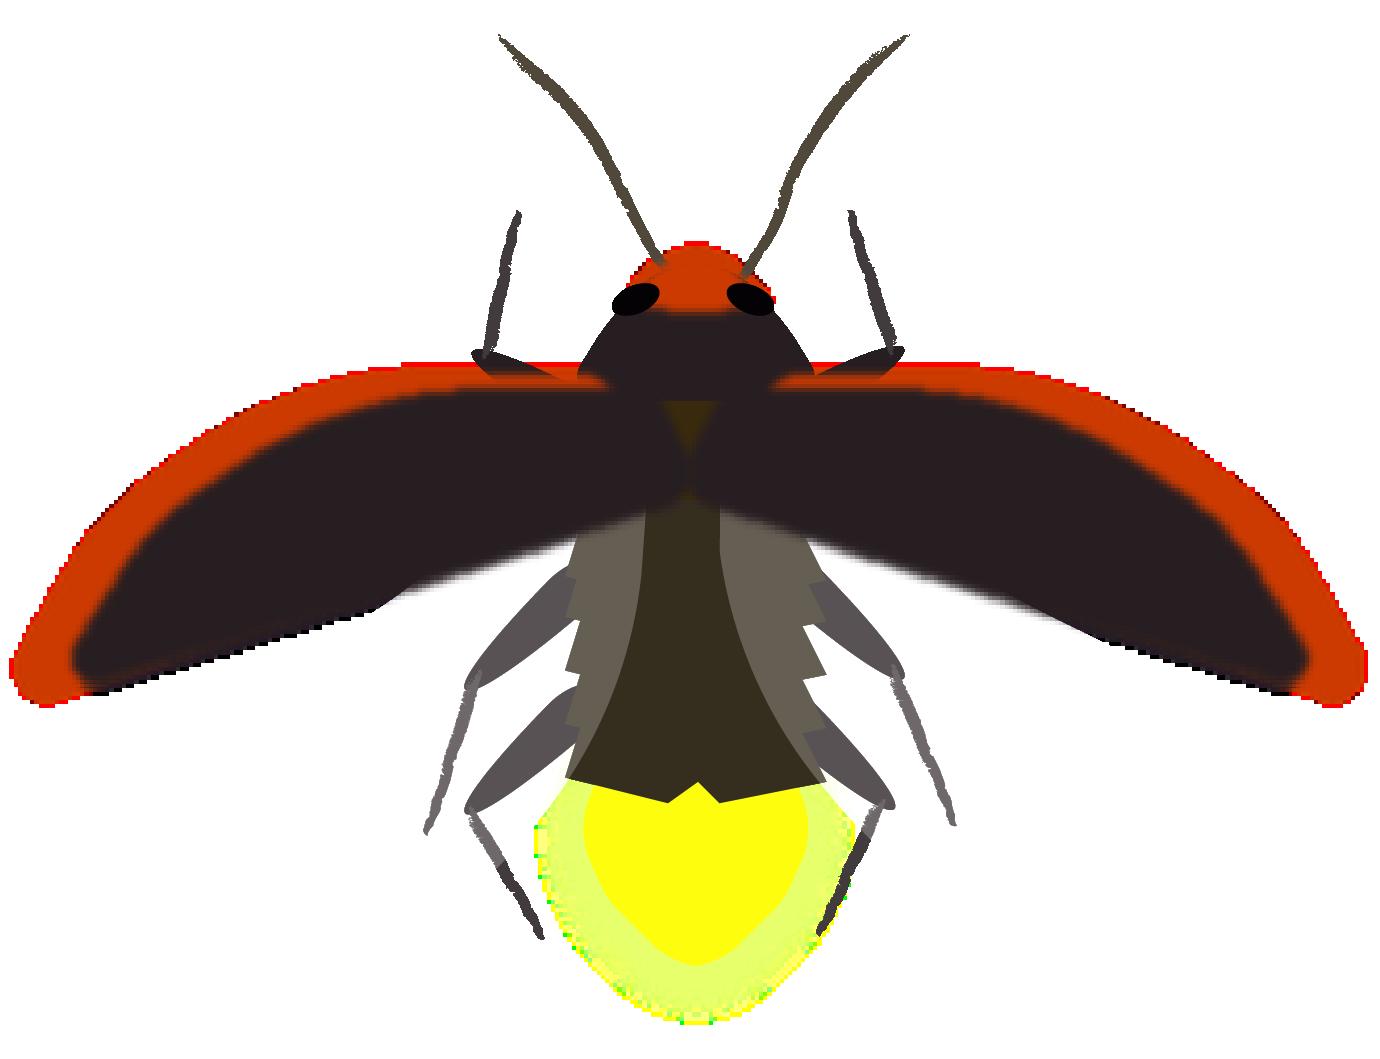 Firefly - d-luciferin dependent luciferase